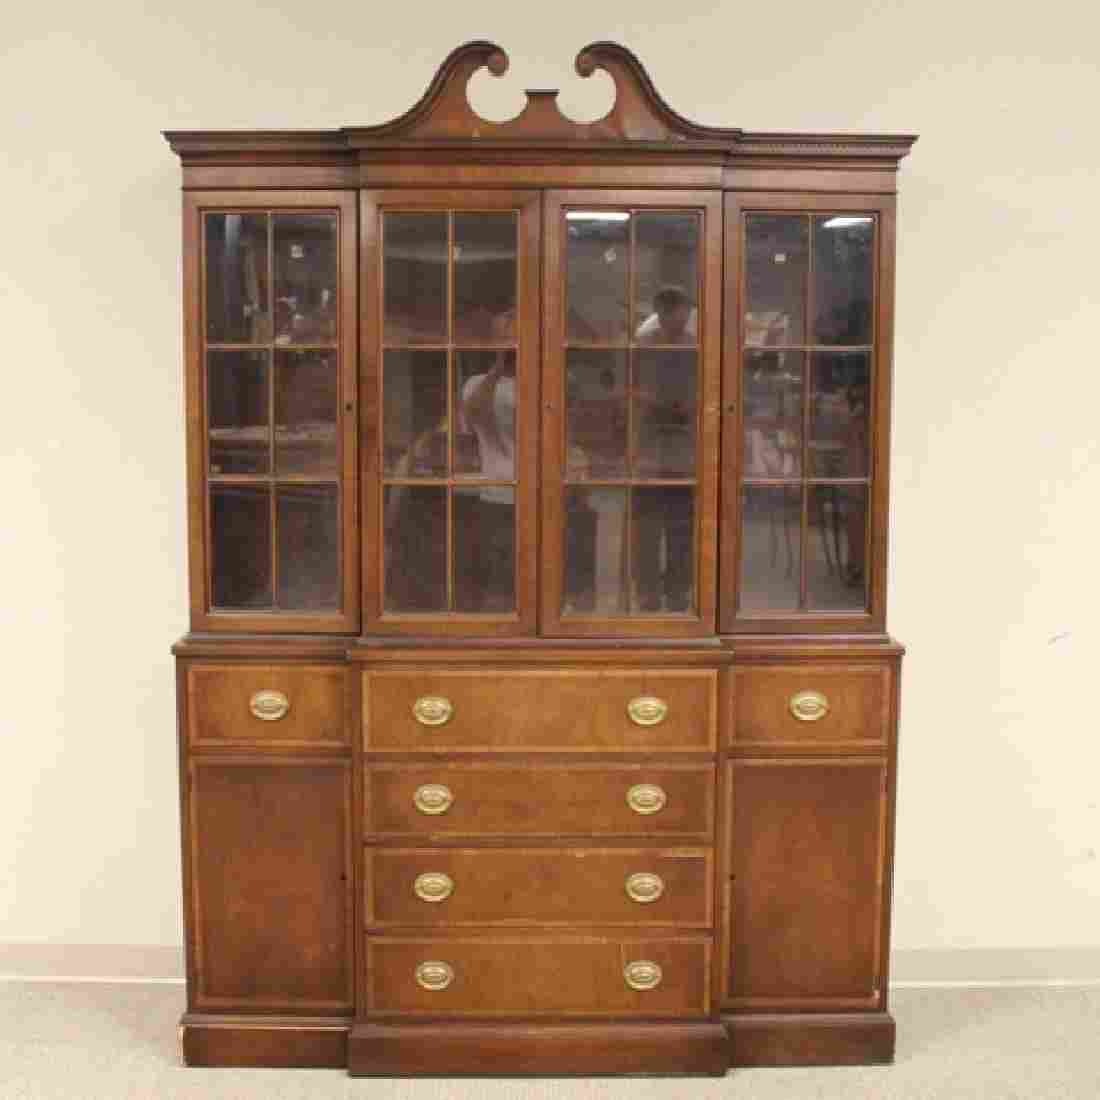 Mahogany Banded Johnson Furniture Co. Breakfront